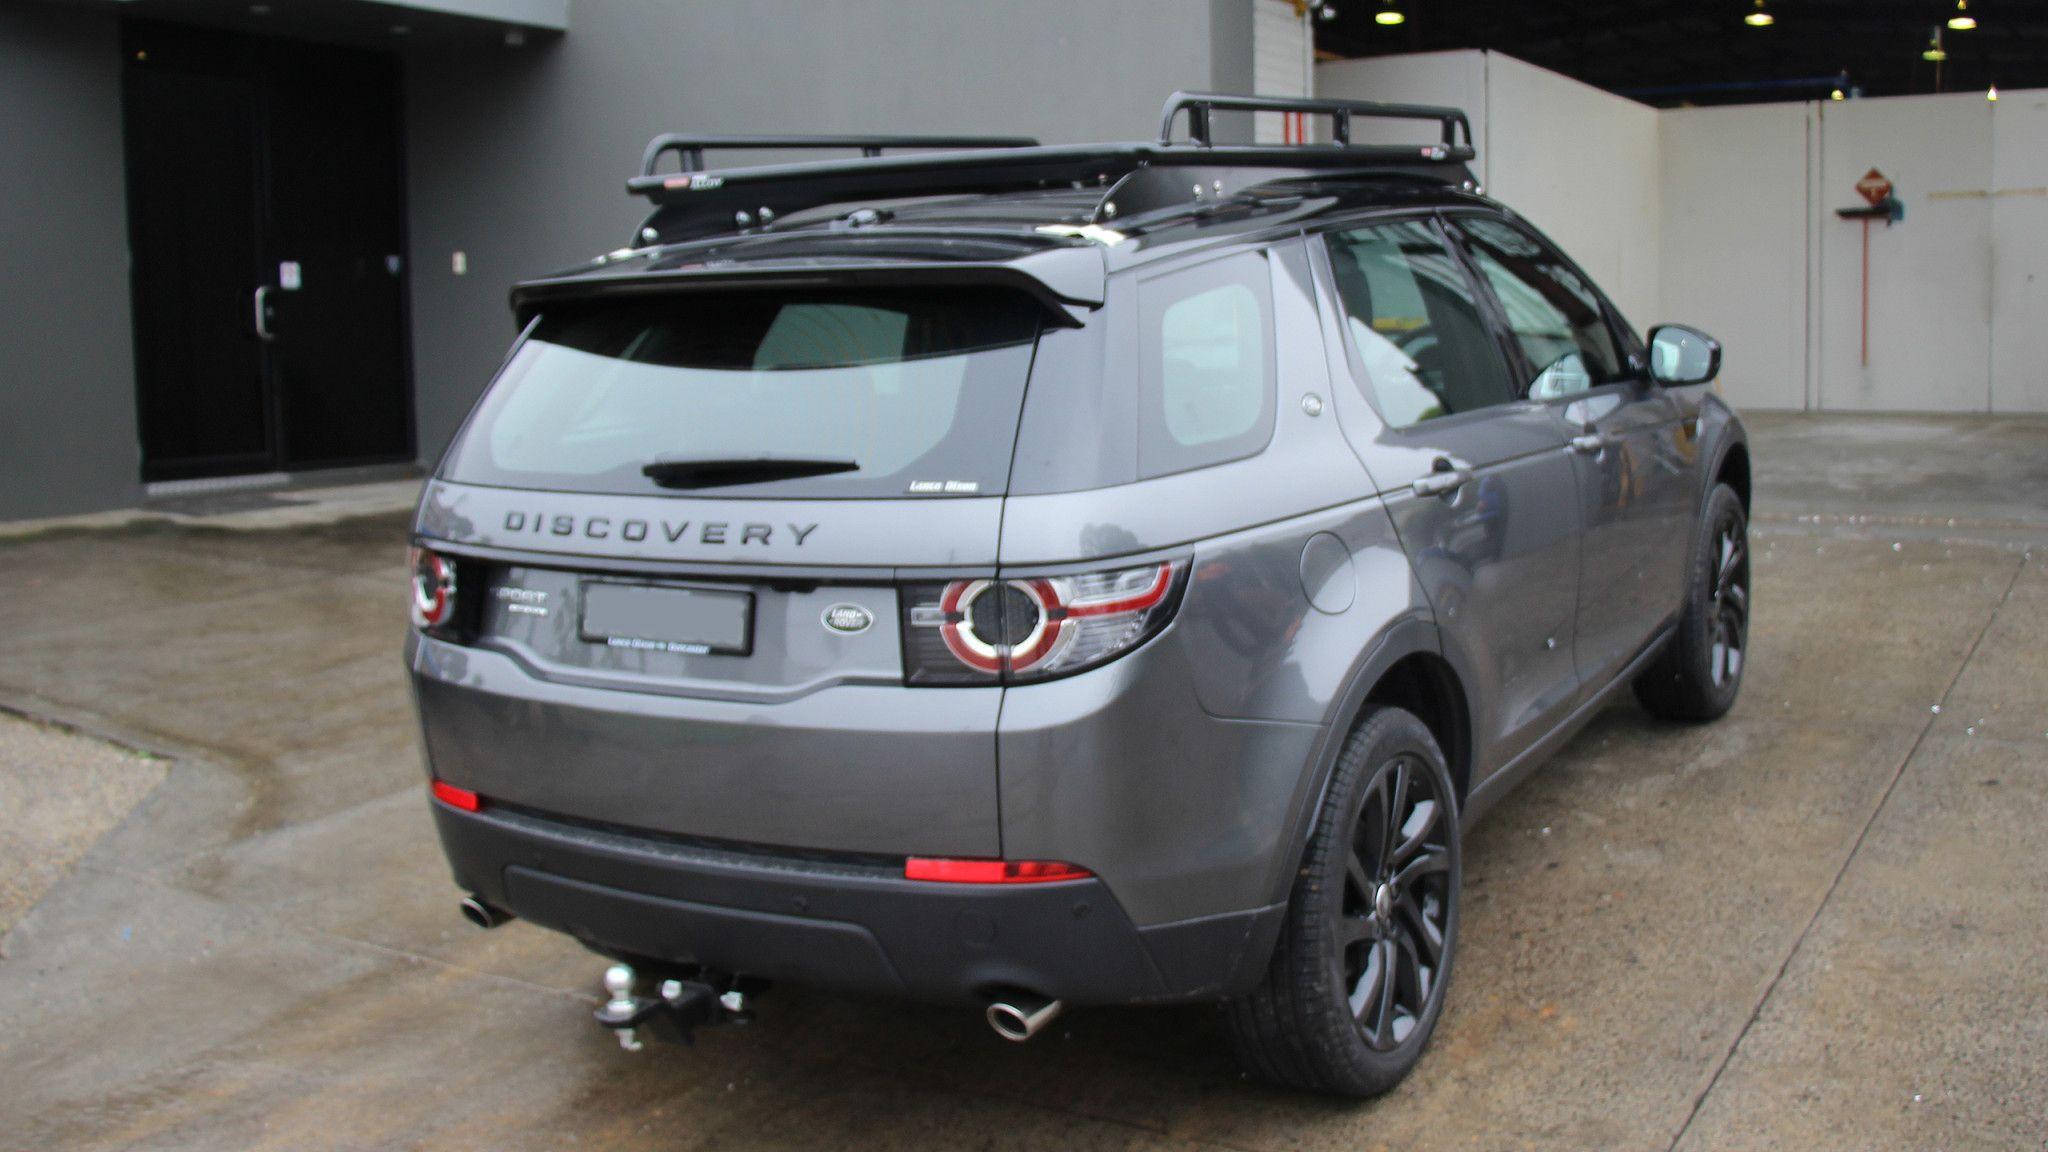 Discovery Sport Roof Racks Range Rover Supercharged Land Rover Discovery Sport Land Rover